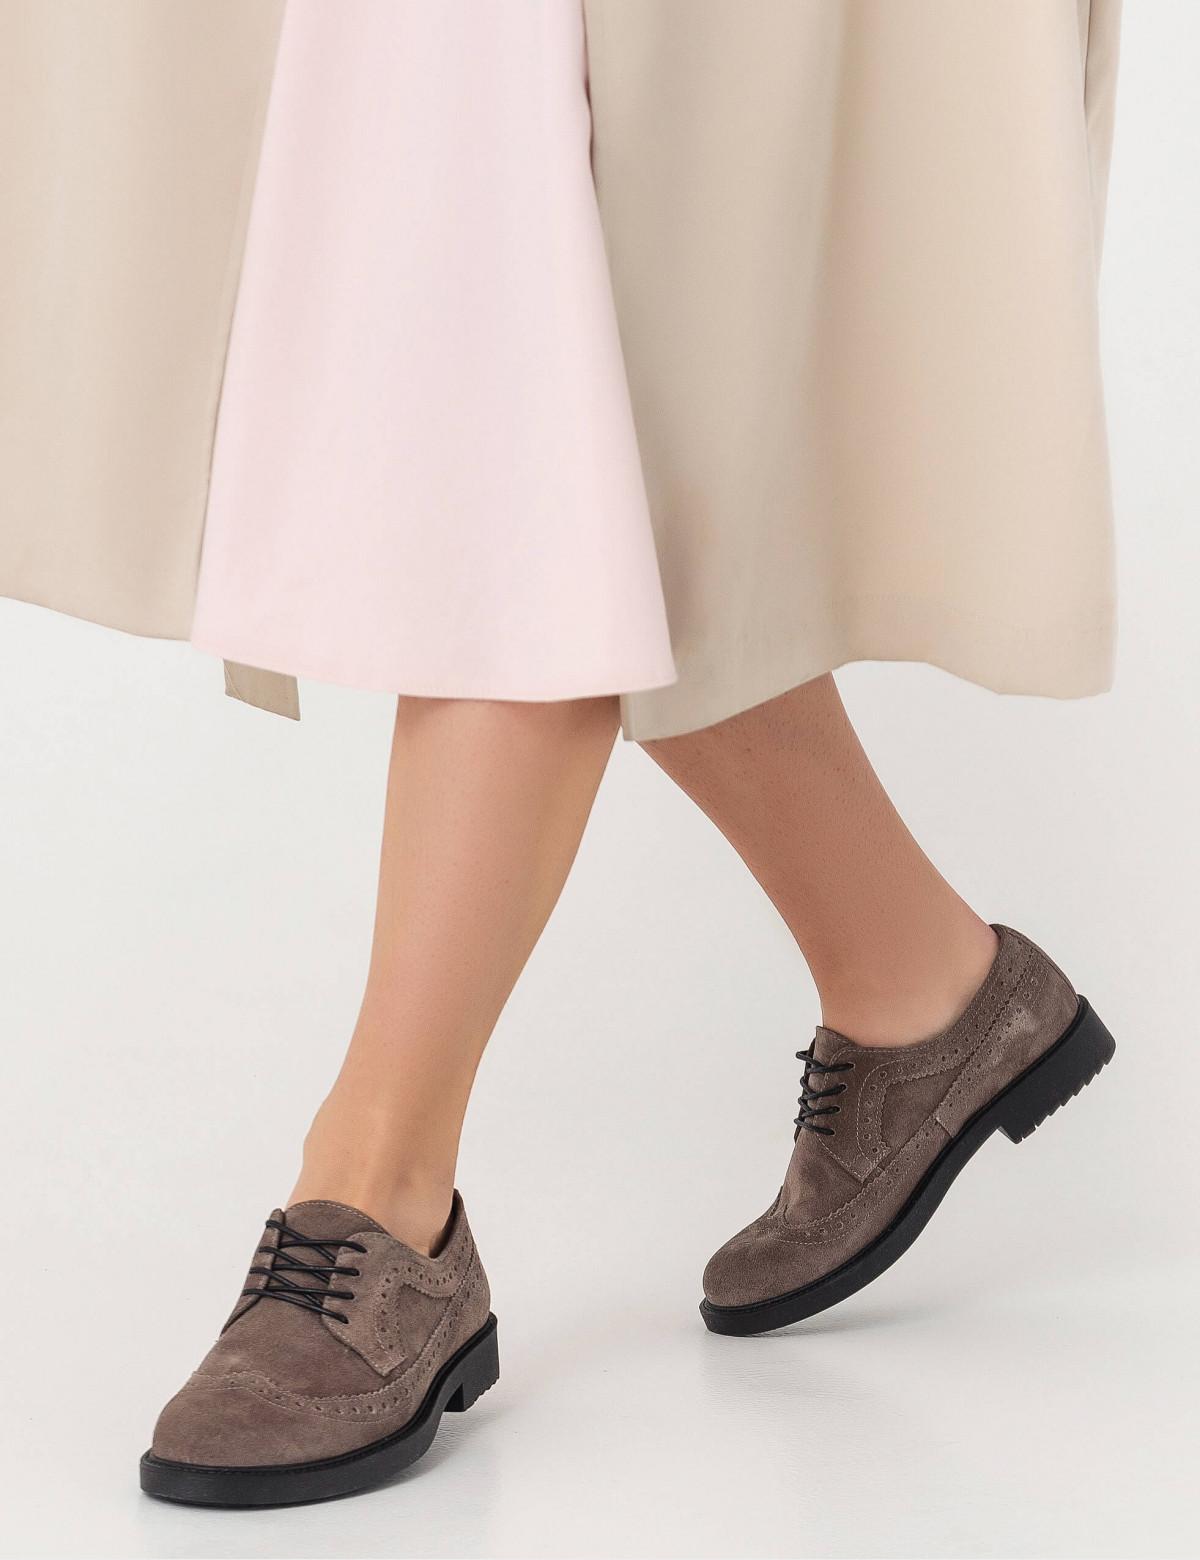 Туфлі темно-бежеві, натуральна замша6